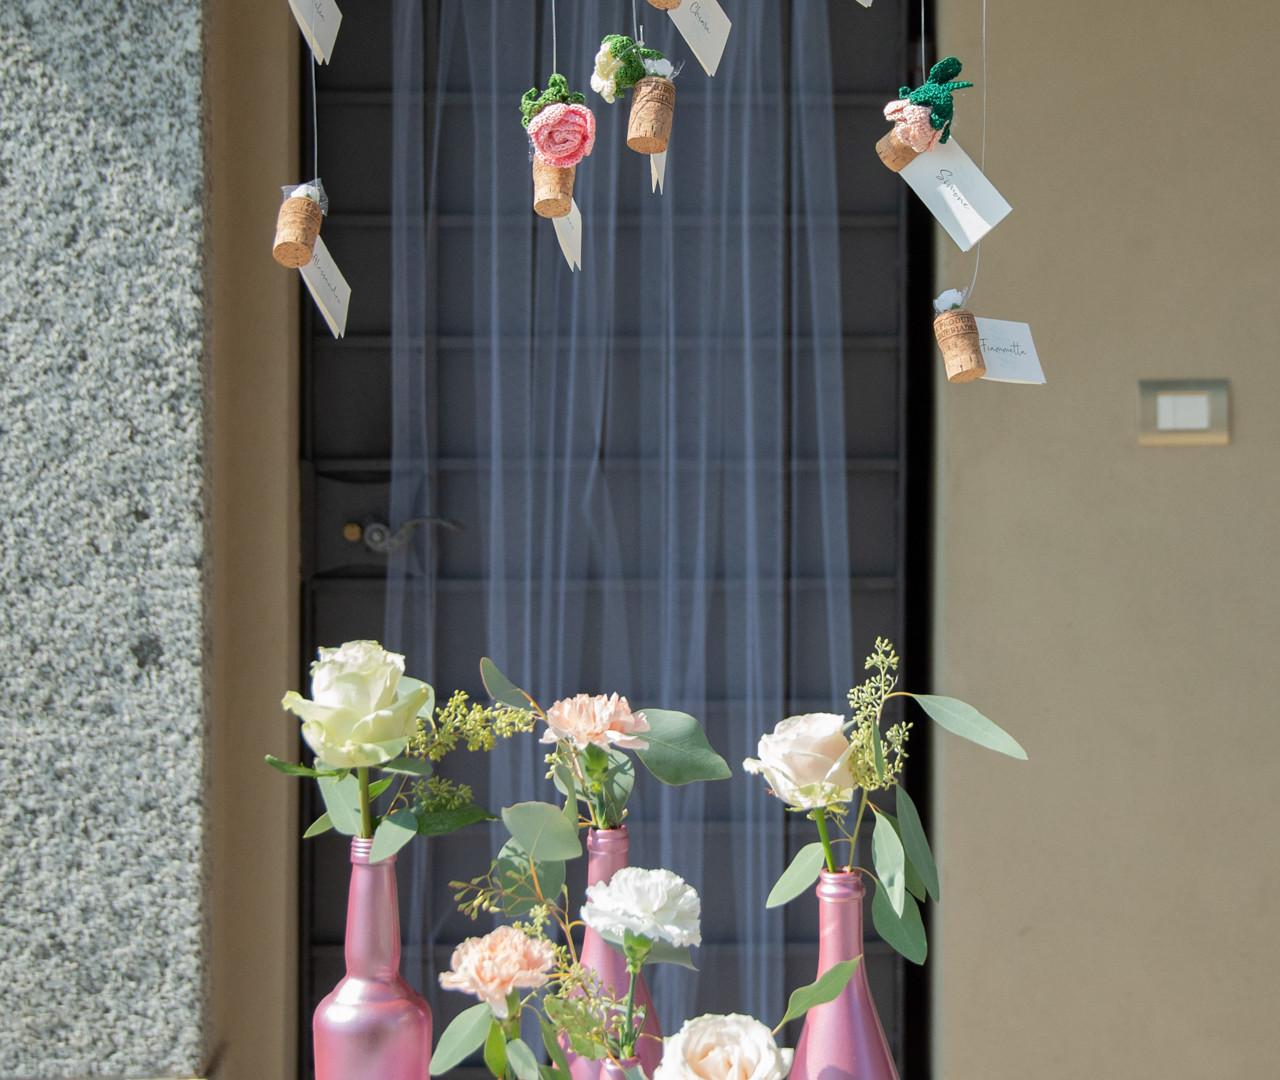 Villa Confalonieri . tableau de mariage realizzato da Manuela Gioria